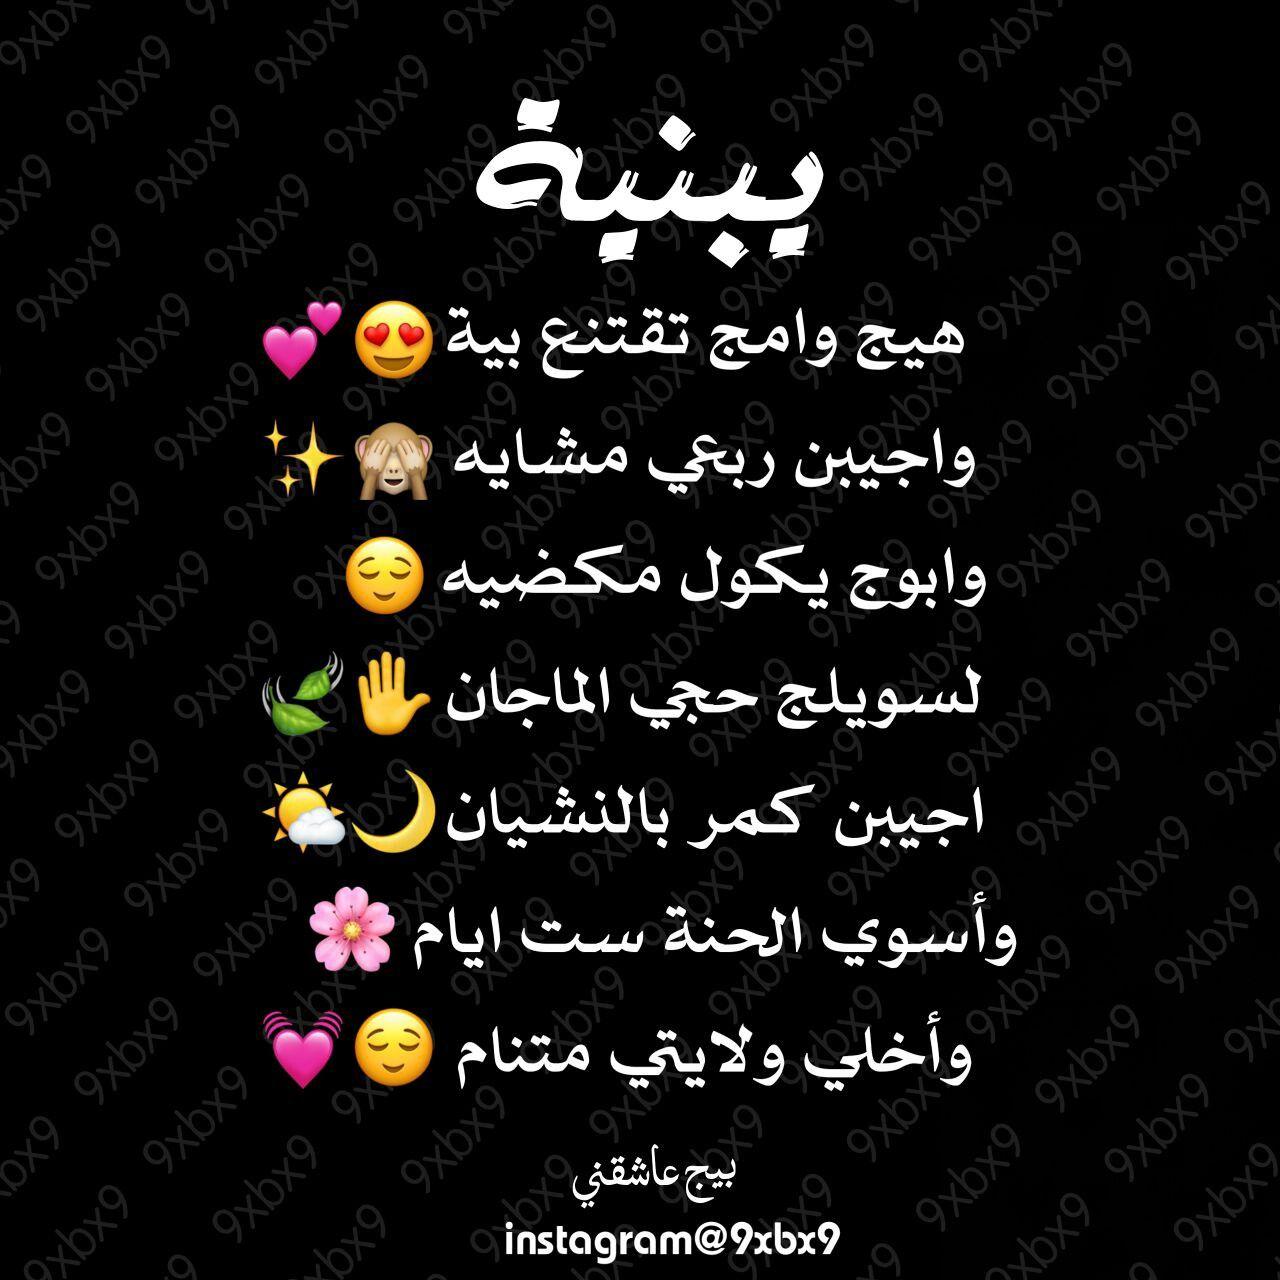 غزل عراقي حب شعر Iphone Wallpaper Quotes Love Sweet Love Quotes Funny Arabic Quotes